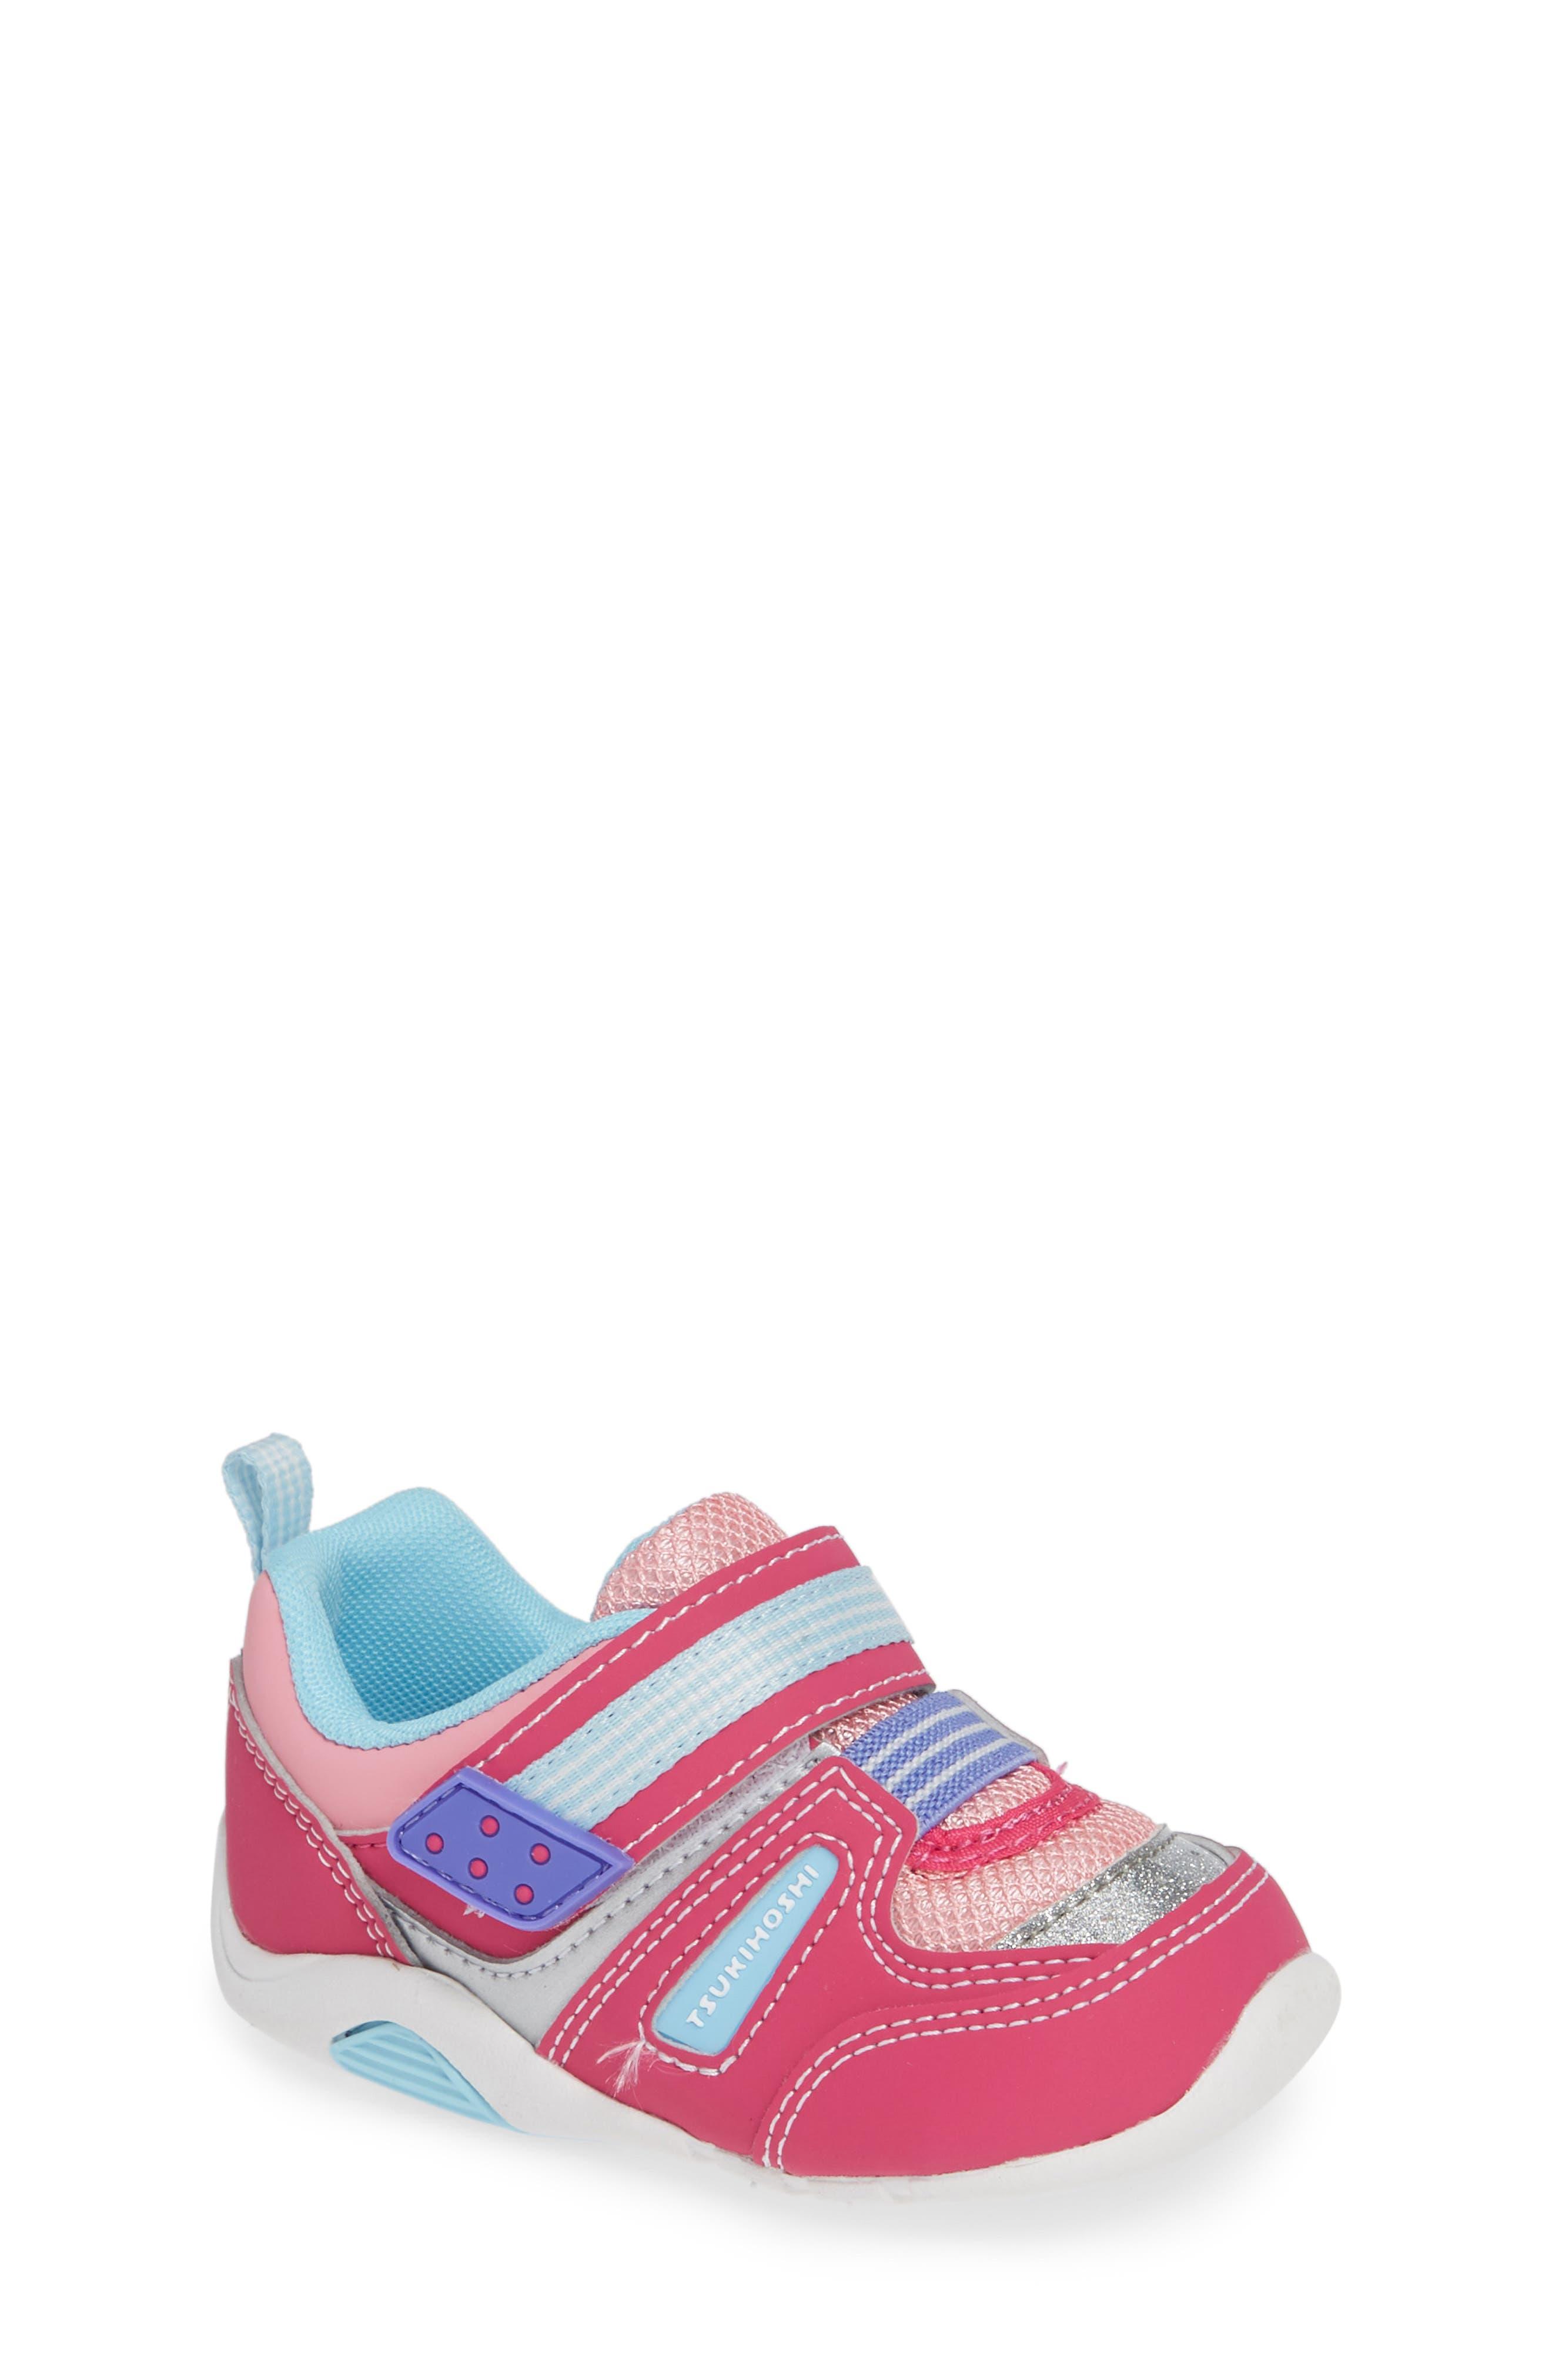 Infant Girls Tsukihoshi Neko Washable Sneaker Size 4 M  Pink